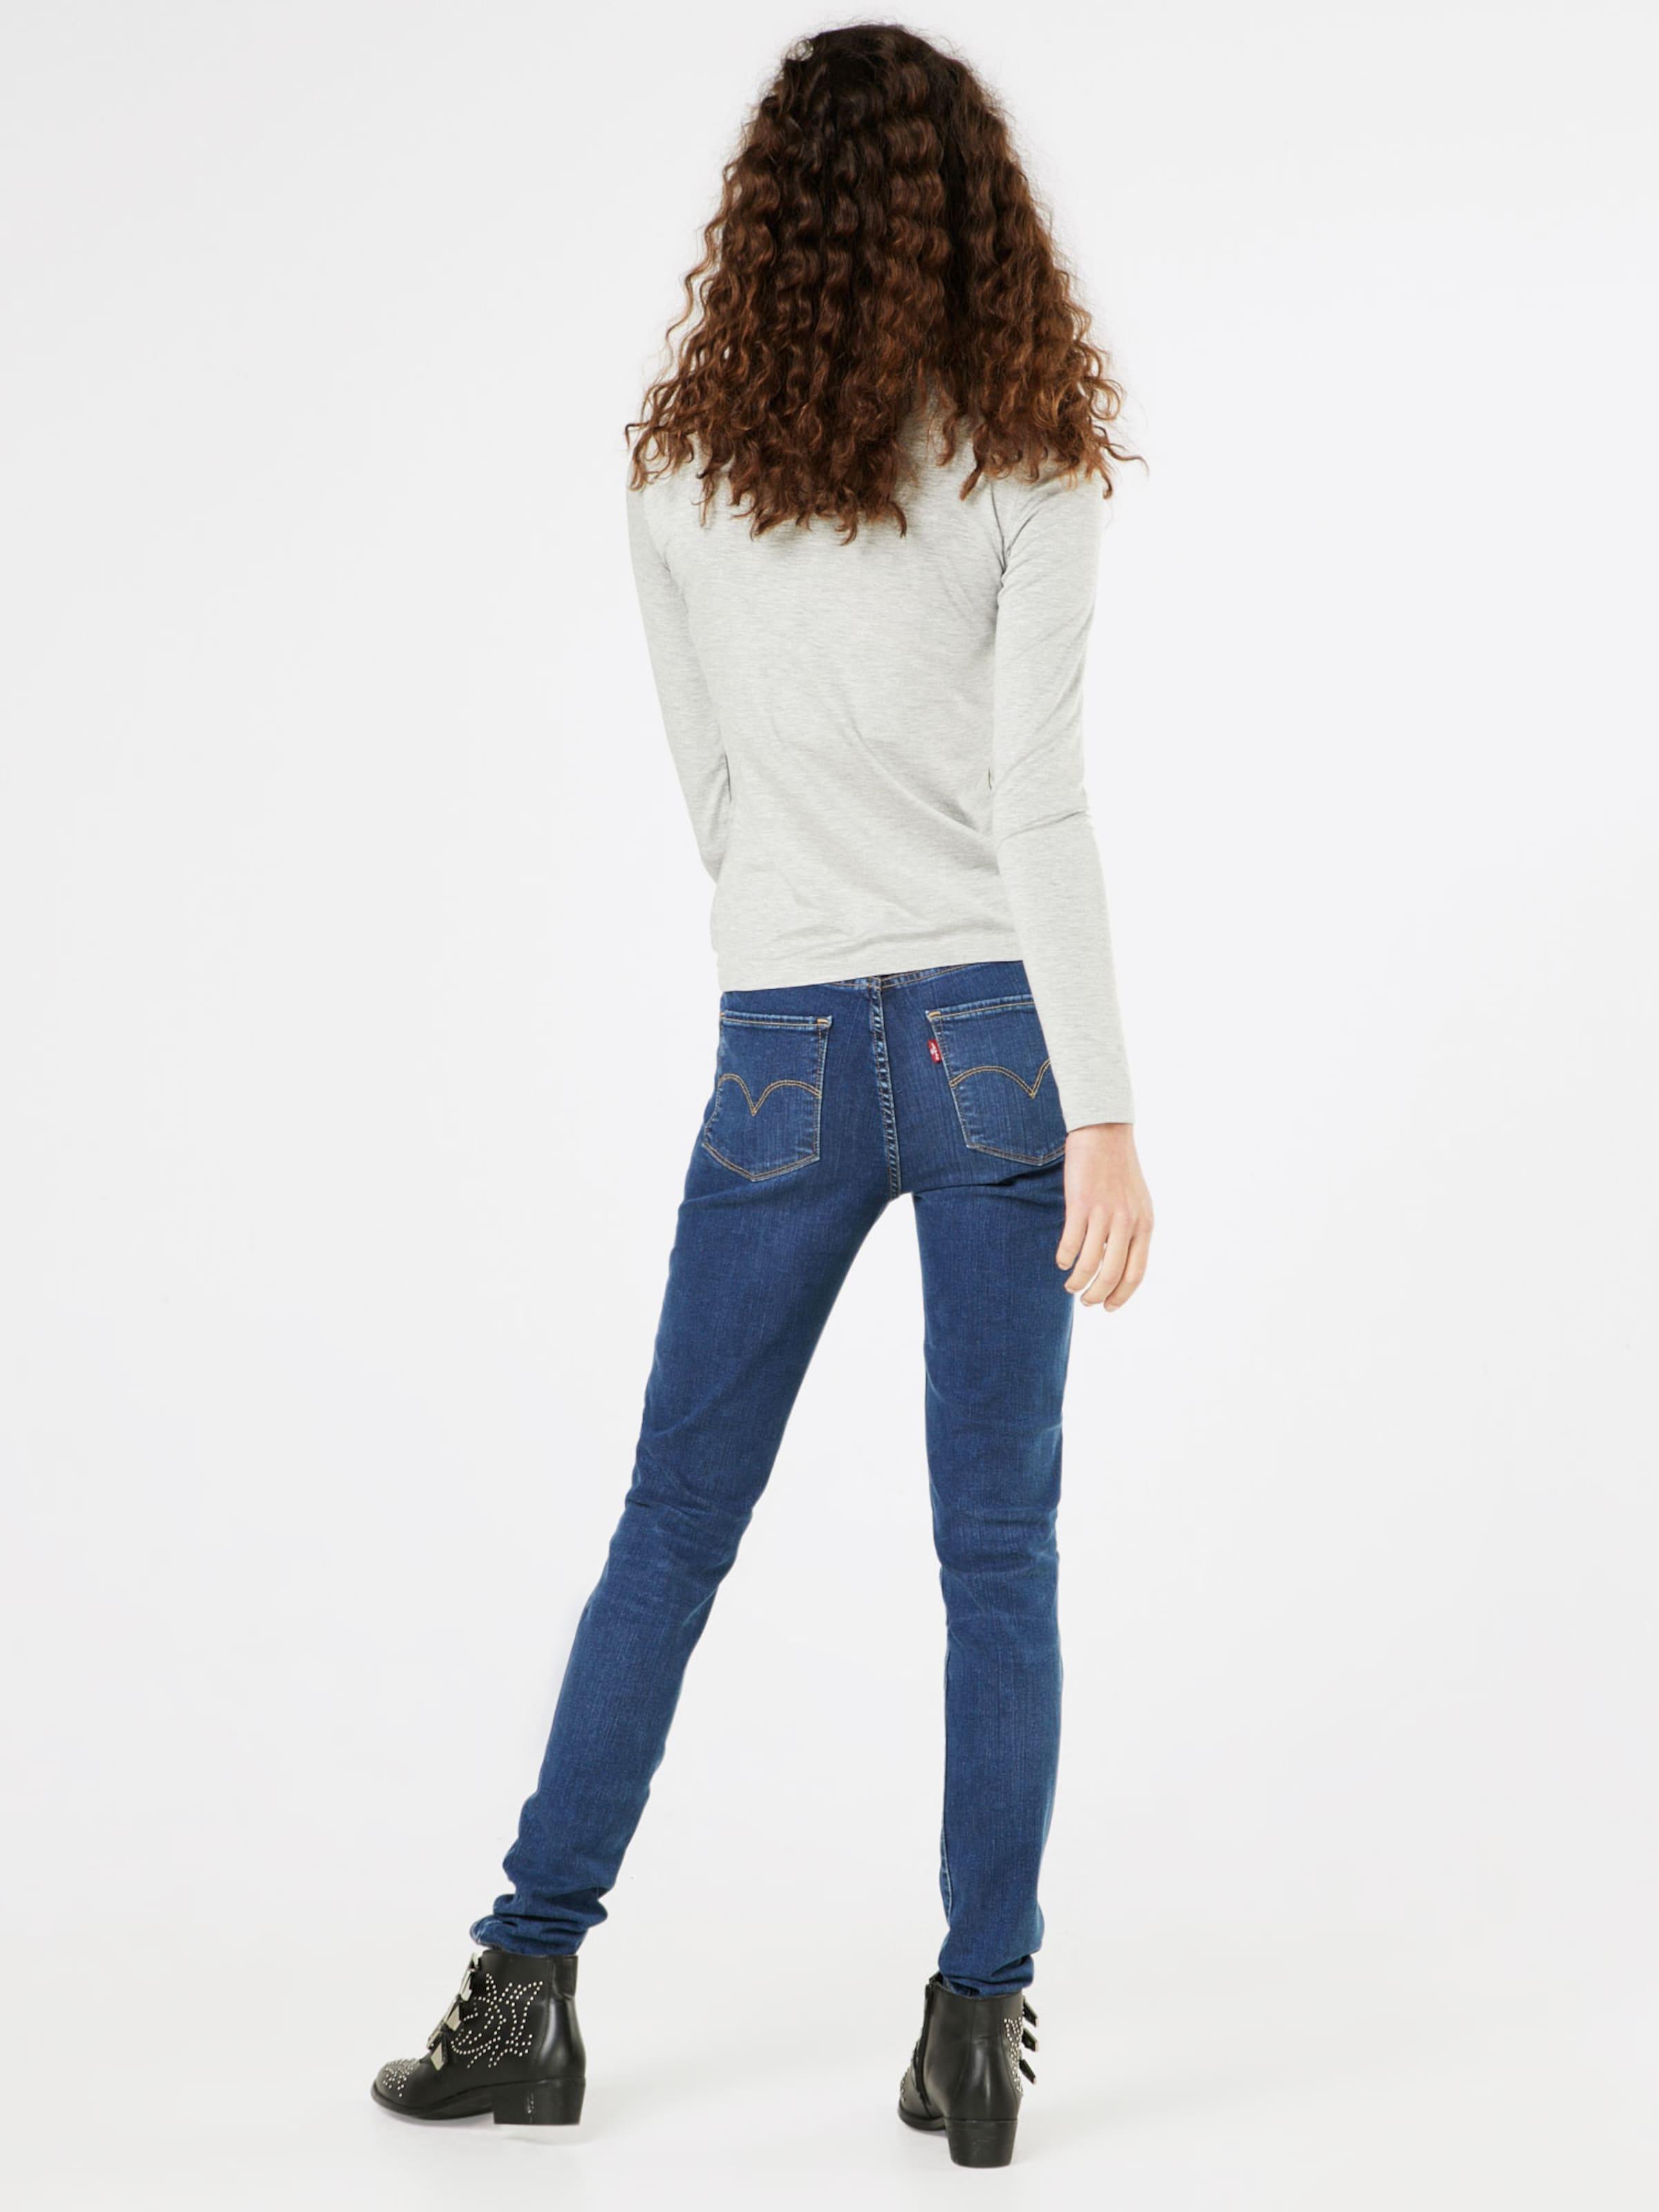 LEVI'S '721' High Rise Skinny Jeans Besonders pjM5X5